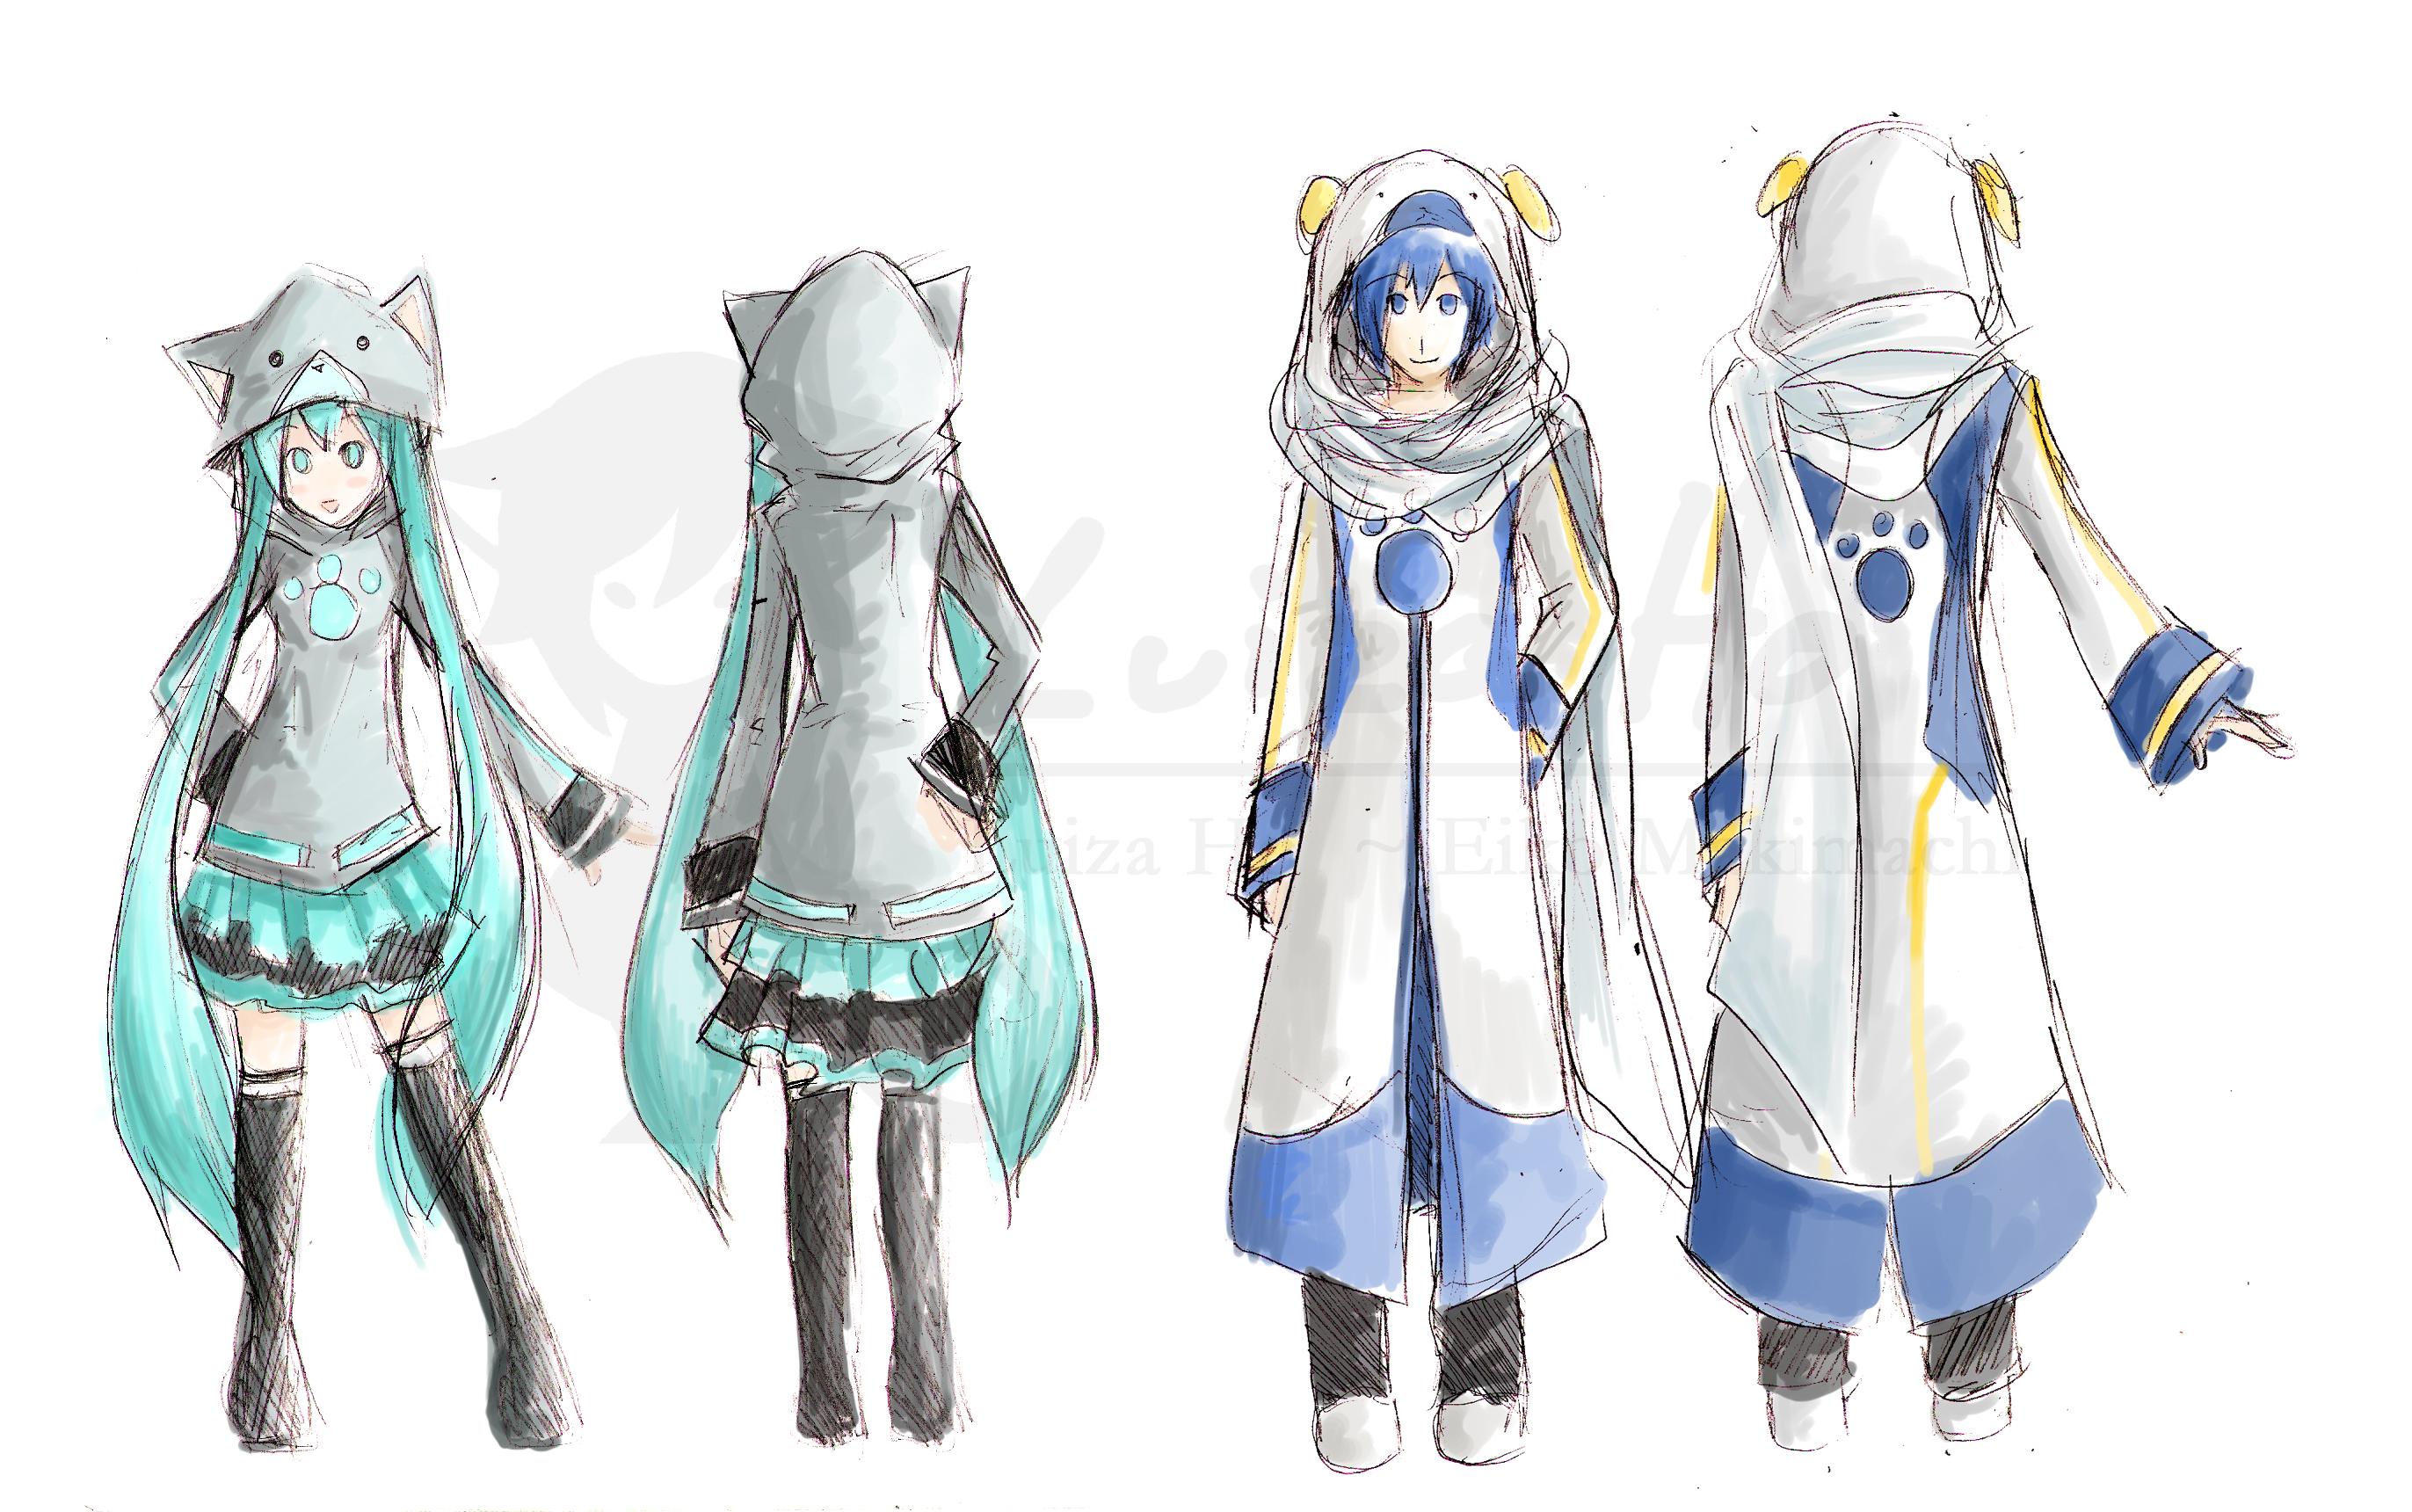 ♪ Mikan Yukiko ♫ Toeto_vocaloid_sketch_design_by_eikomakimachi-d34w0hf